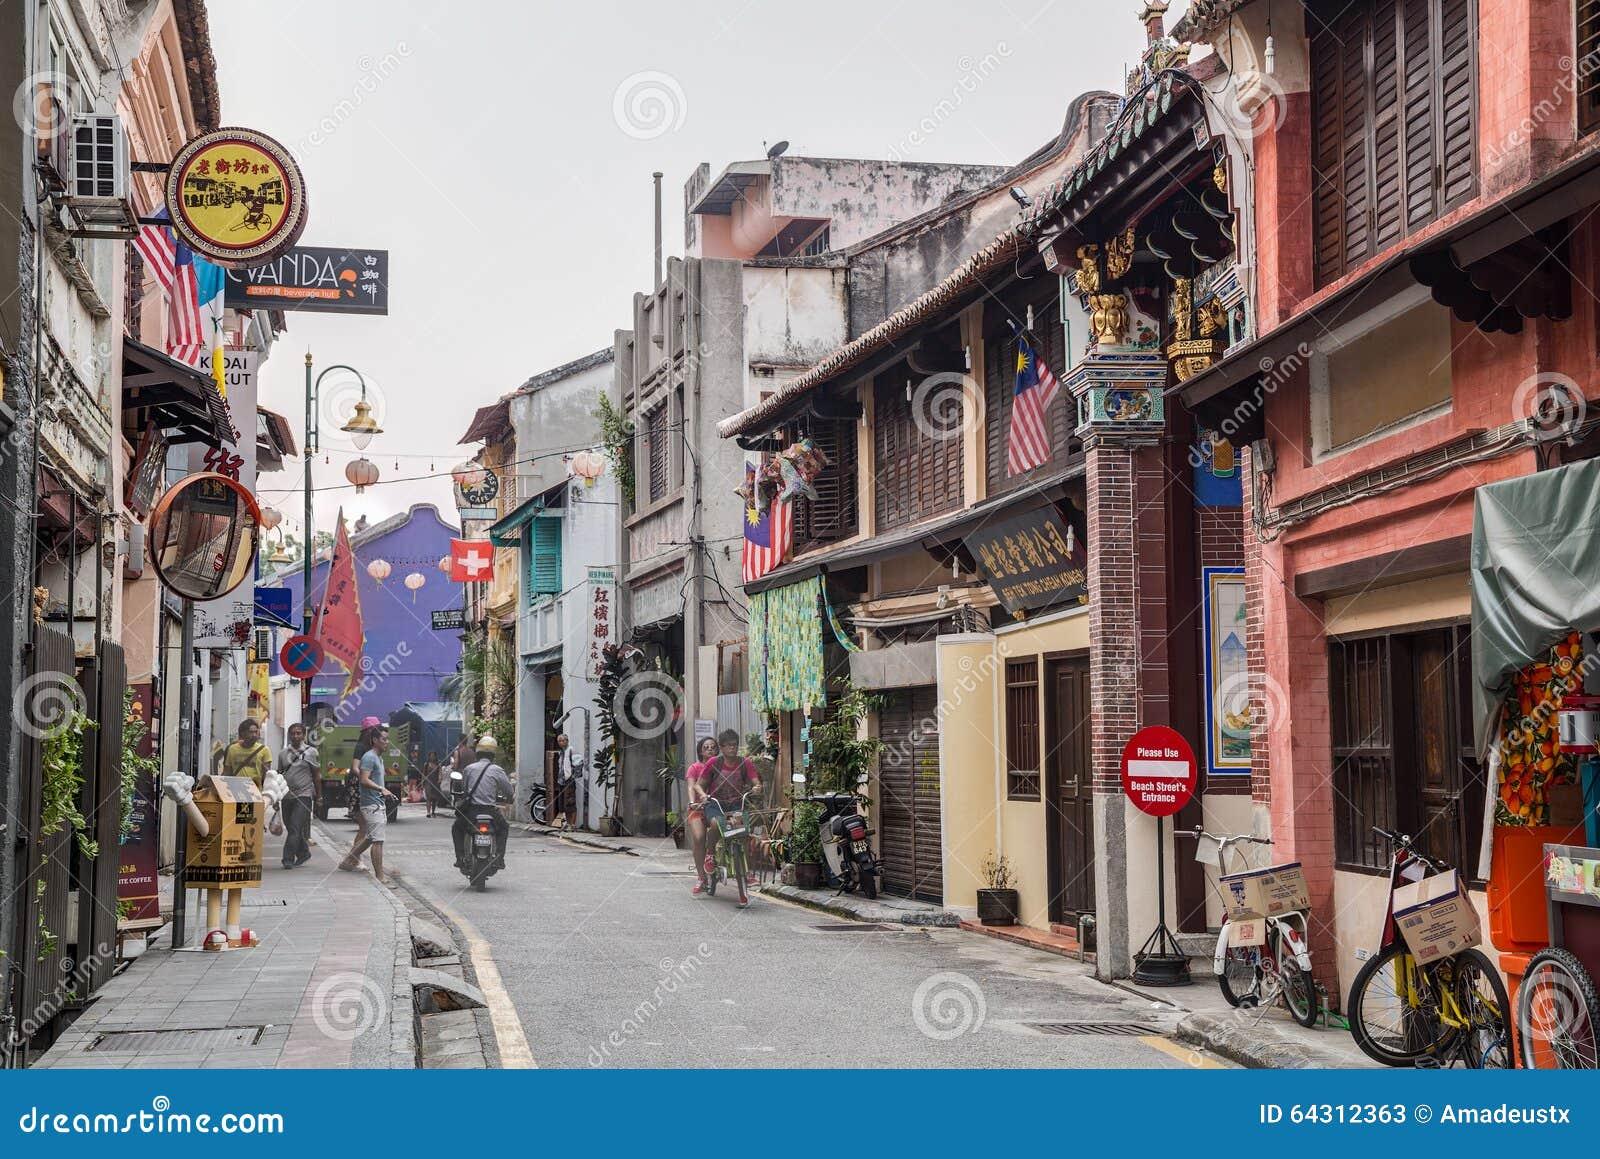 Georgetown, Penang/Malaysia - circa im Oktober 2015: Alte Straßen und Architektur von Georgetown, Penang, Malaysia